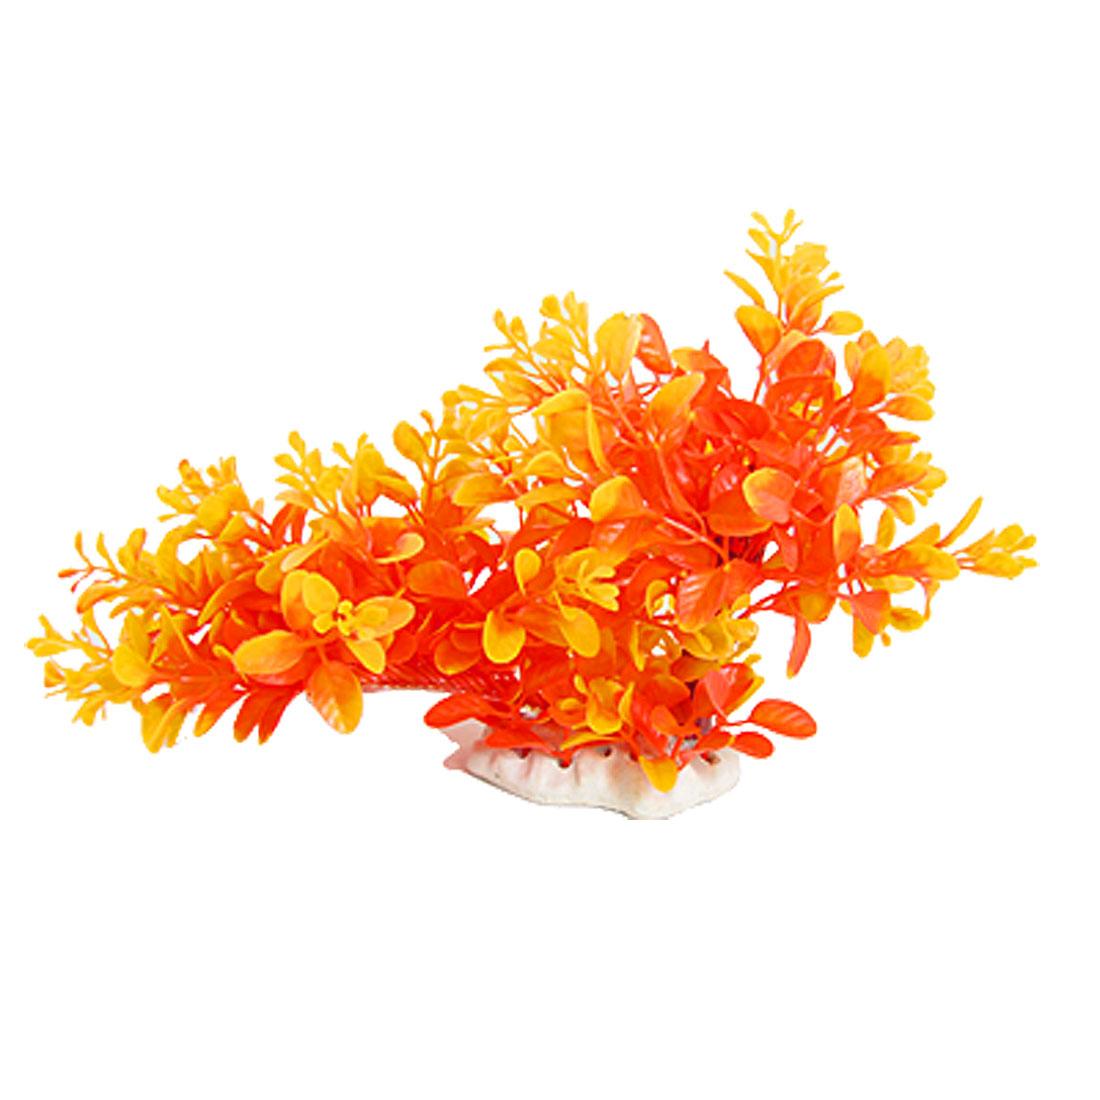 Ceramic Base Orange Yellow Plastic Plant Decor Fish Tank